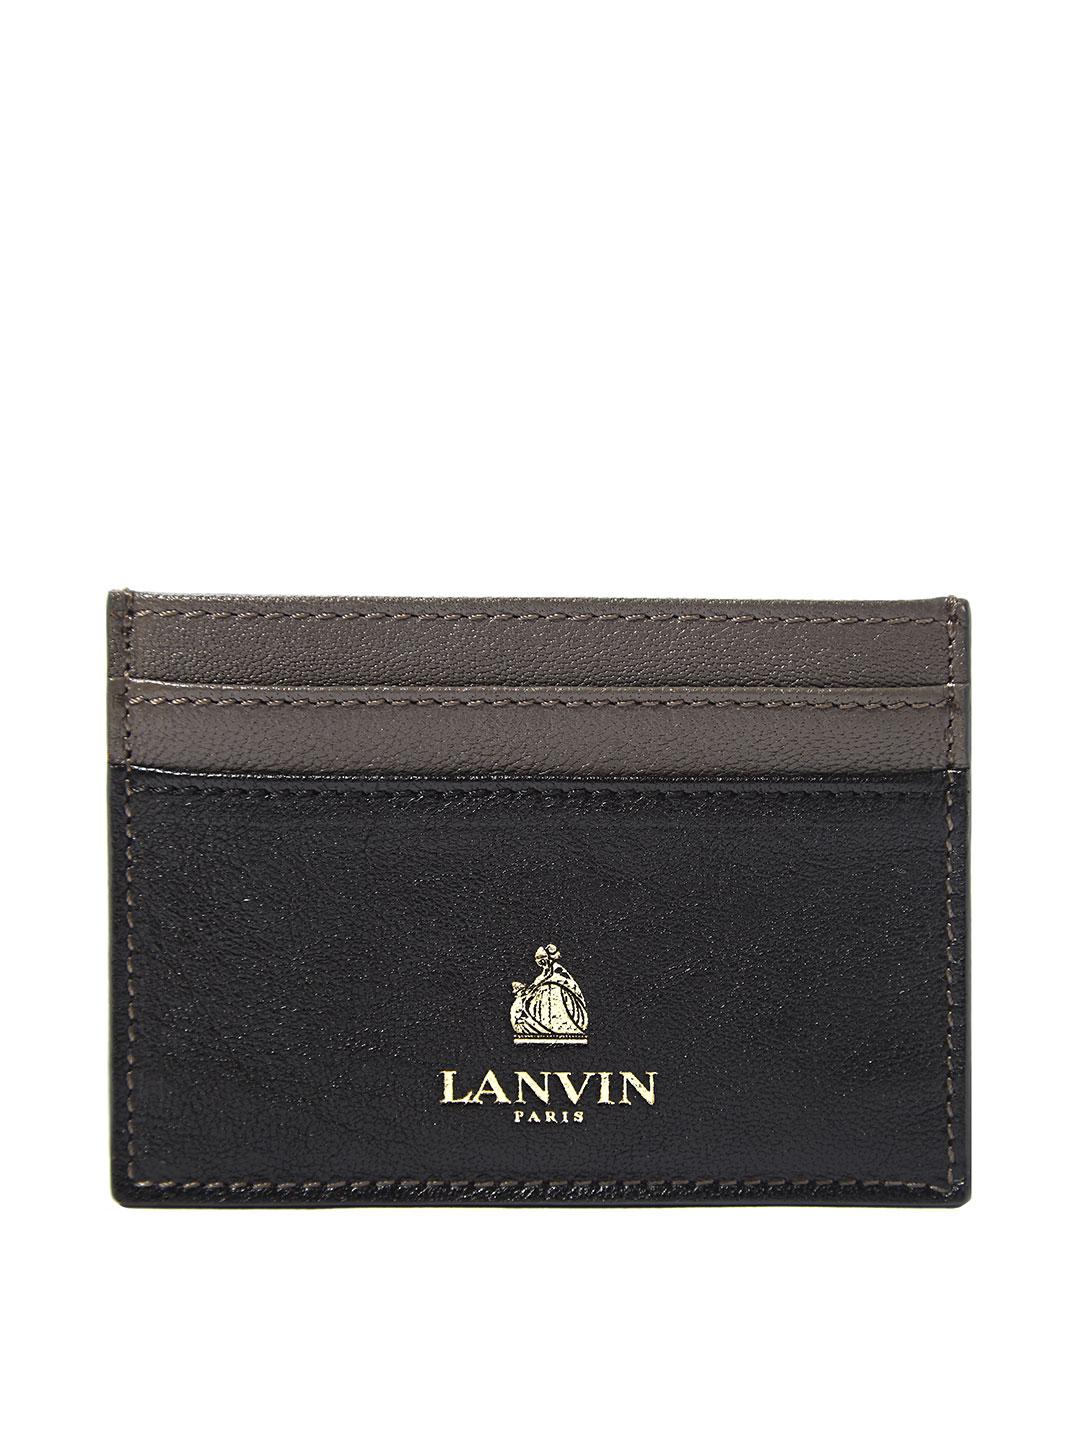 LANVIN Paris Blue Lambskin Leather Small Card Case Holder Wallet Authentic